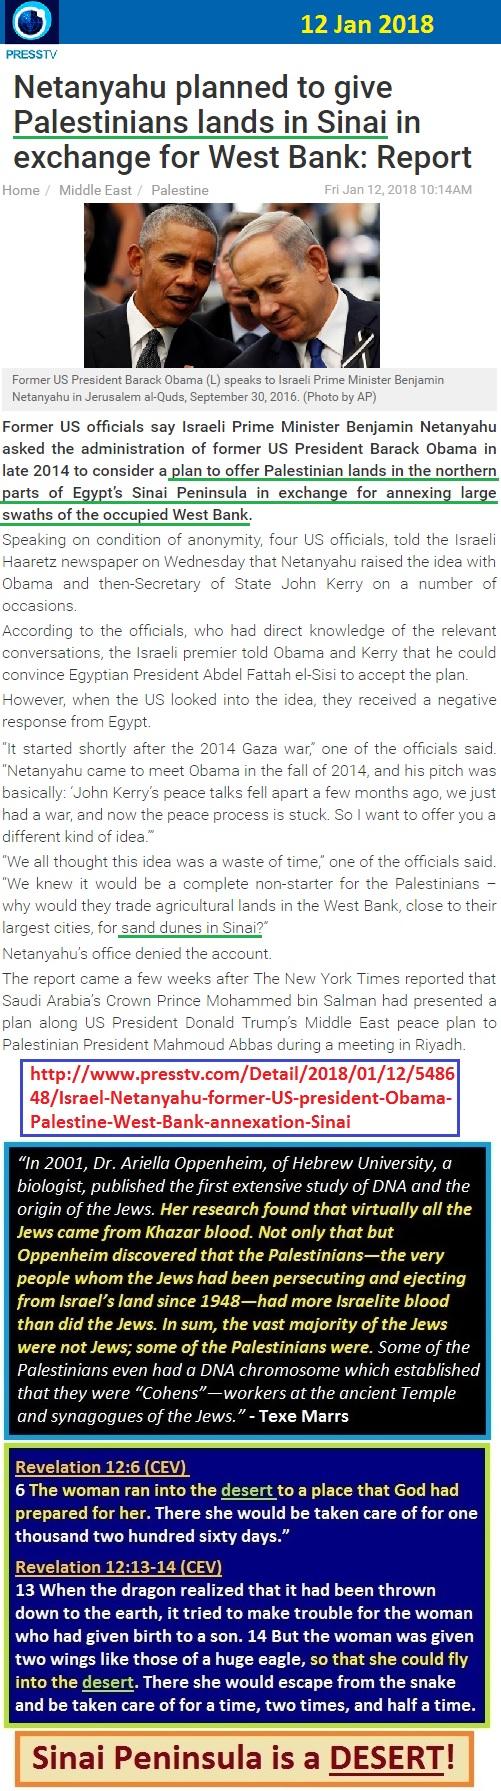 https://www.presstv.com/DetailFr/2018/01/12/548648/Israel-Netanyahu-former-US-president-Obama-Palestine-West-Bank-annexation-Sinai